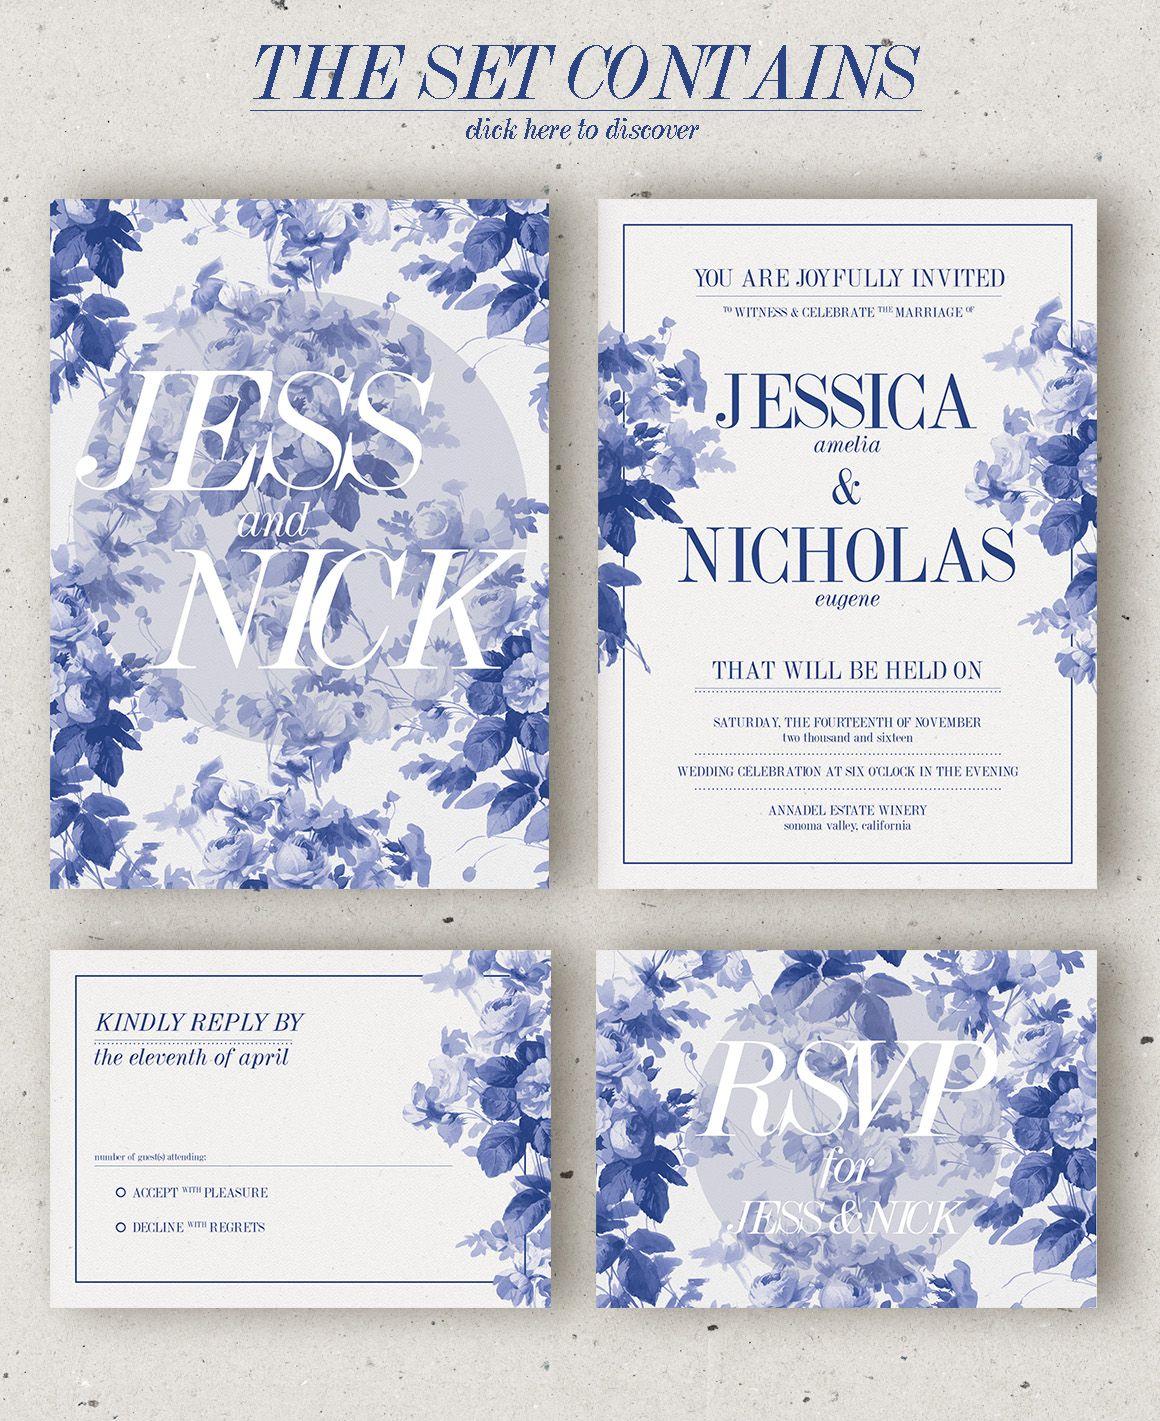 China Blue Wedding Invitation Template PSD #design Download:  Https://creativemarket.com/klapauciusco/352456?uu003dksioks